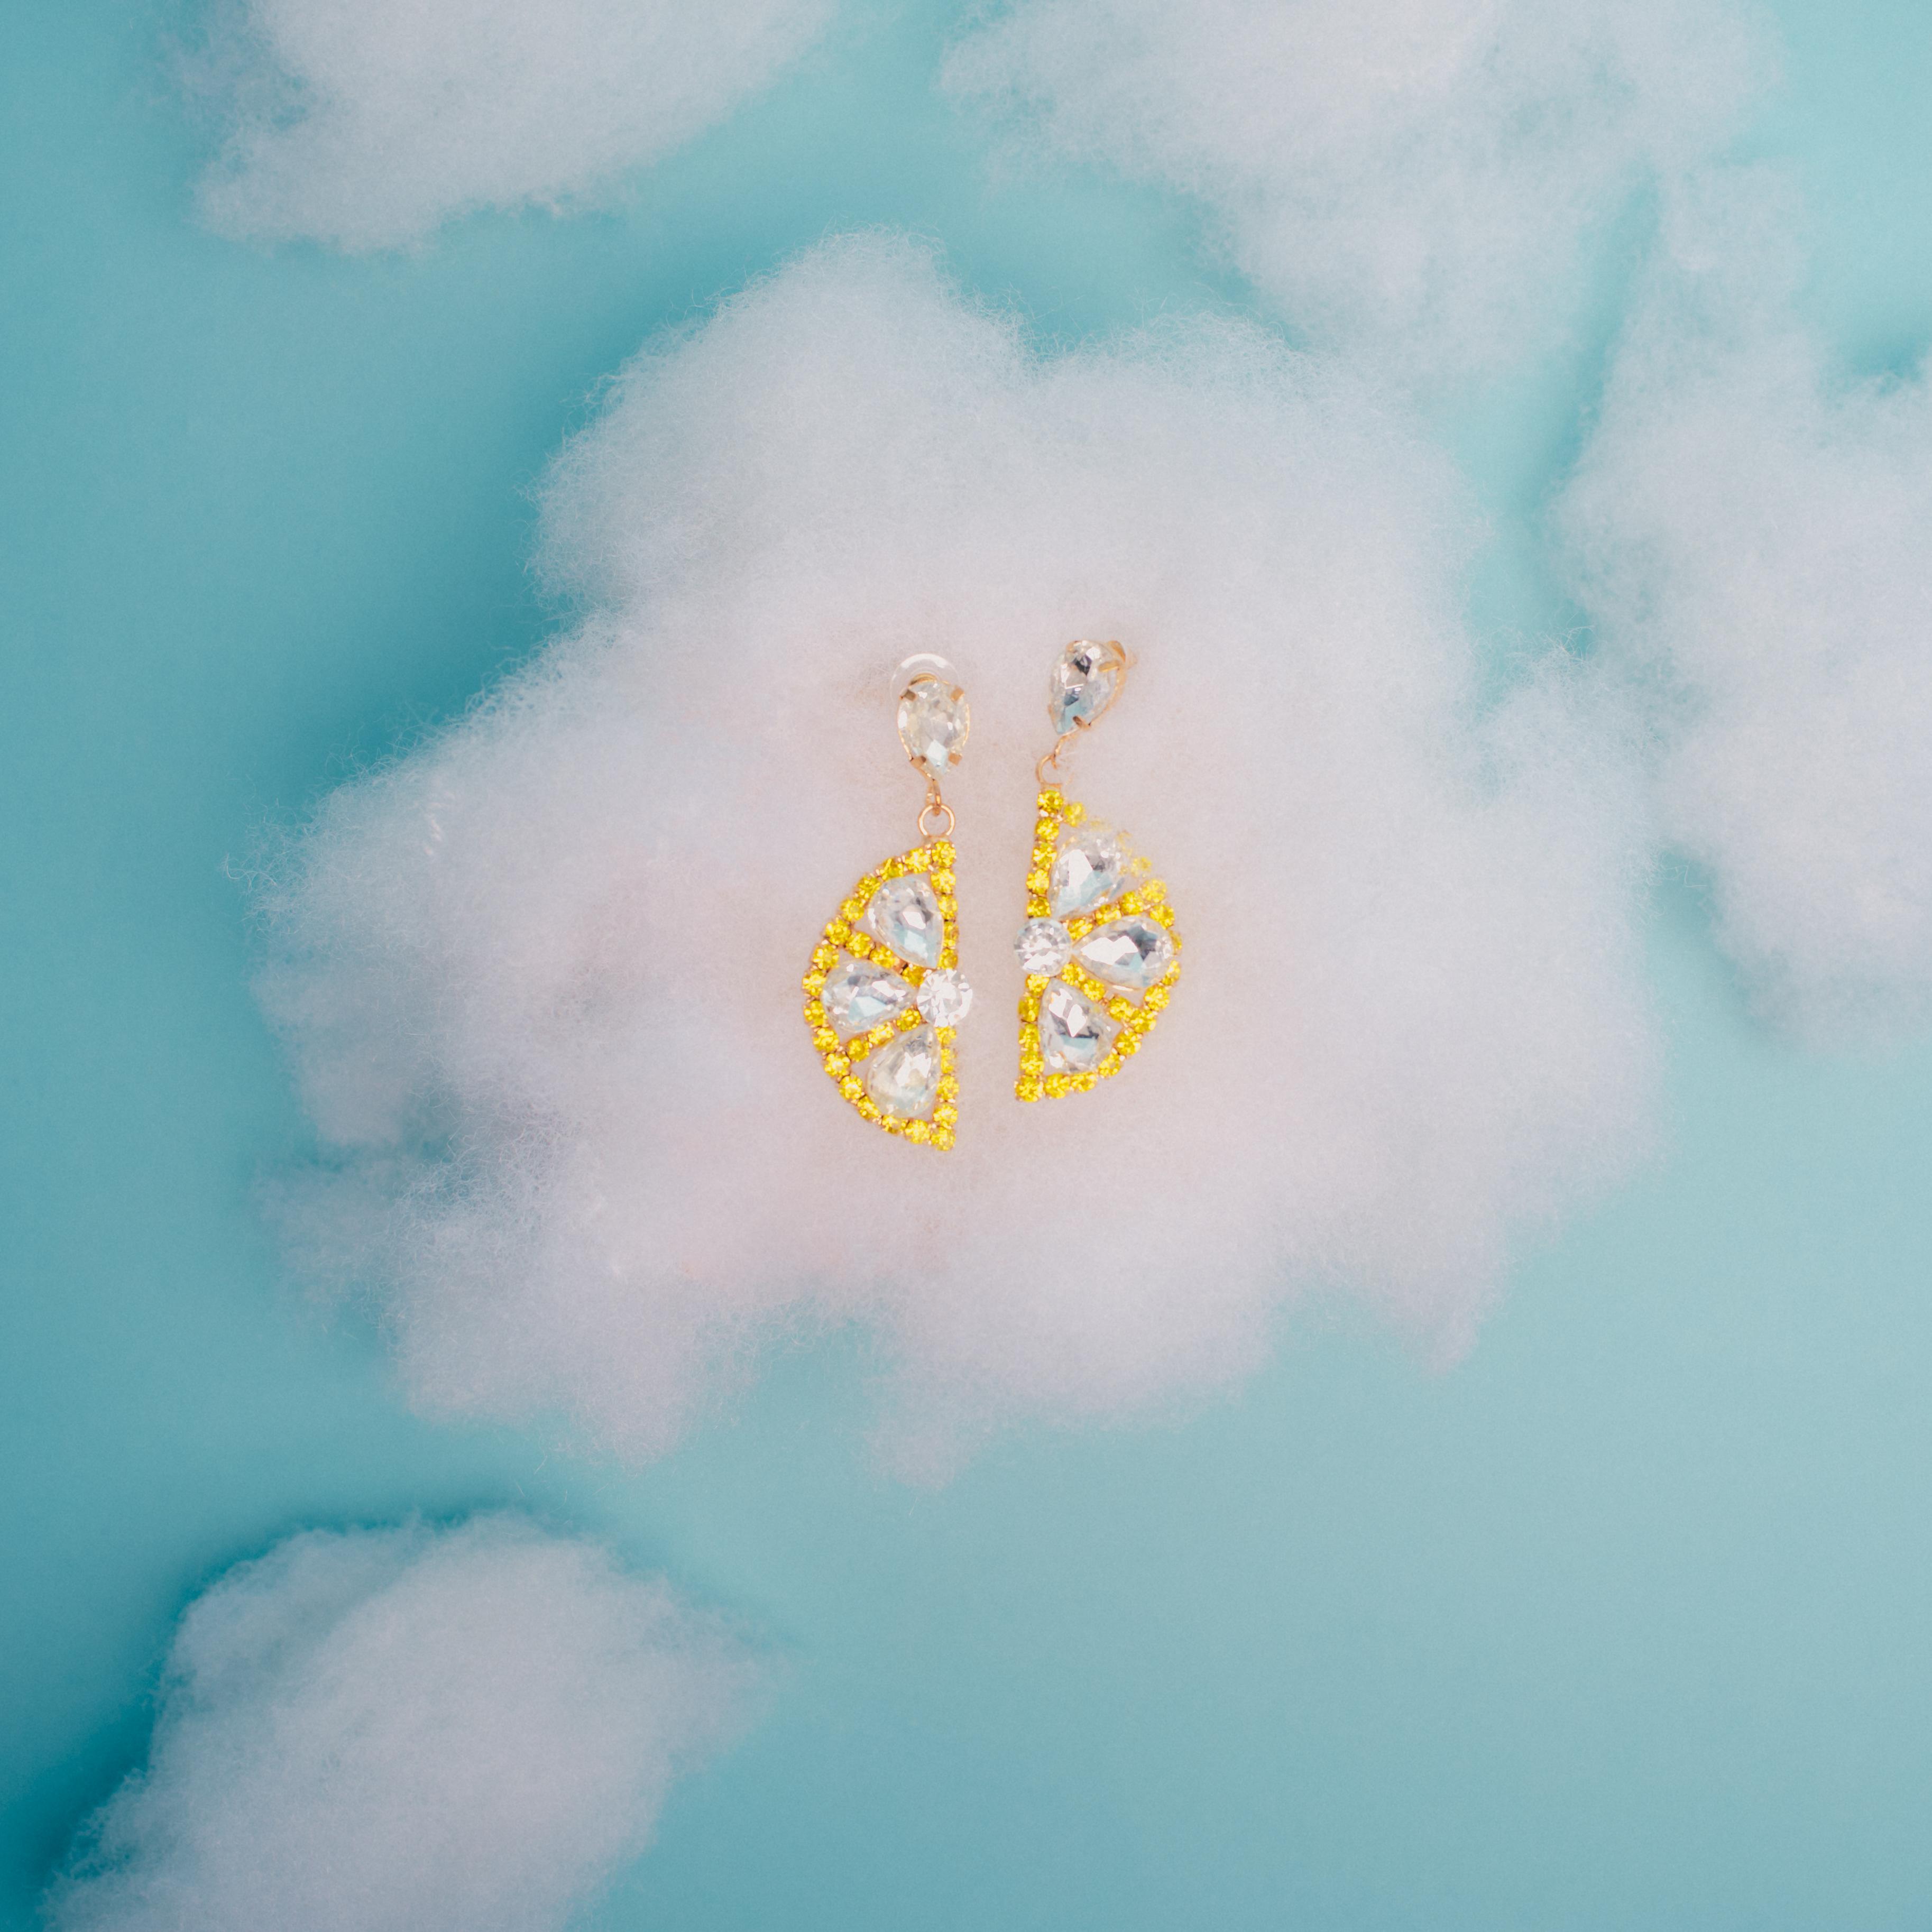 Lemon Earrings